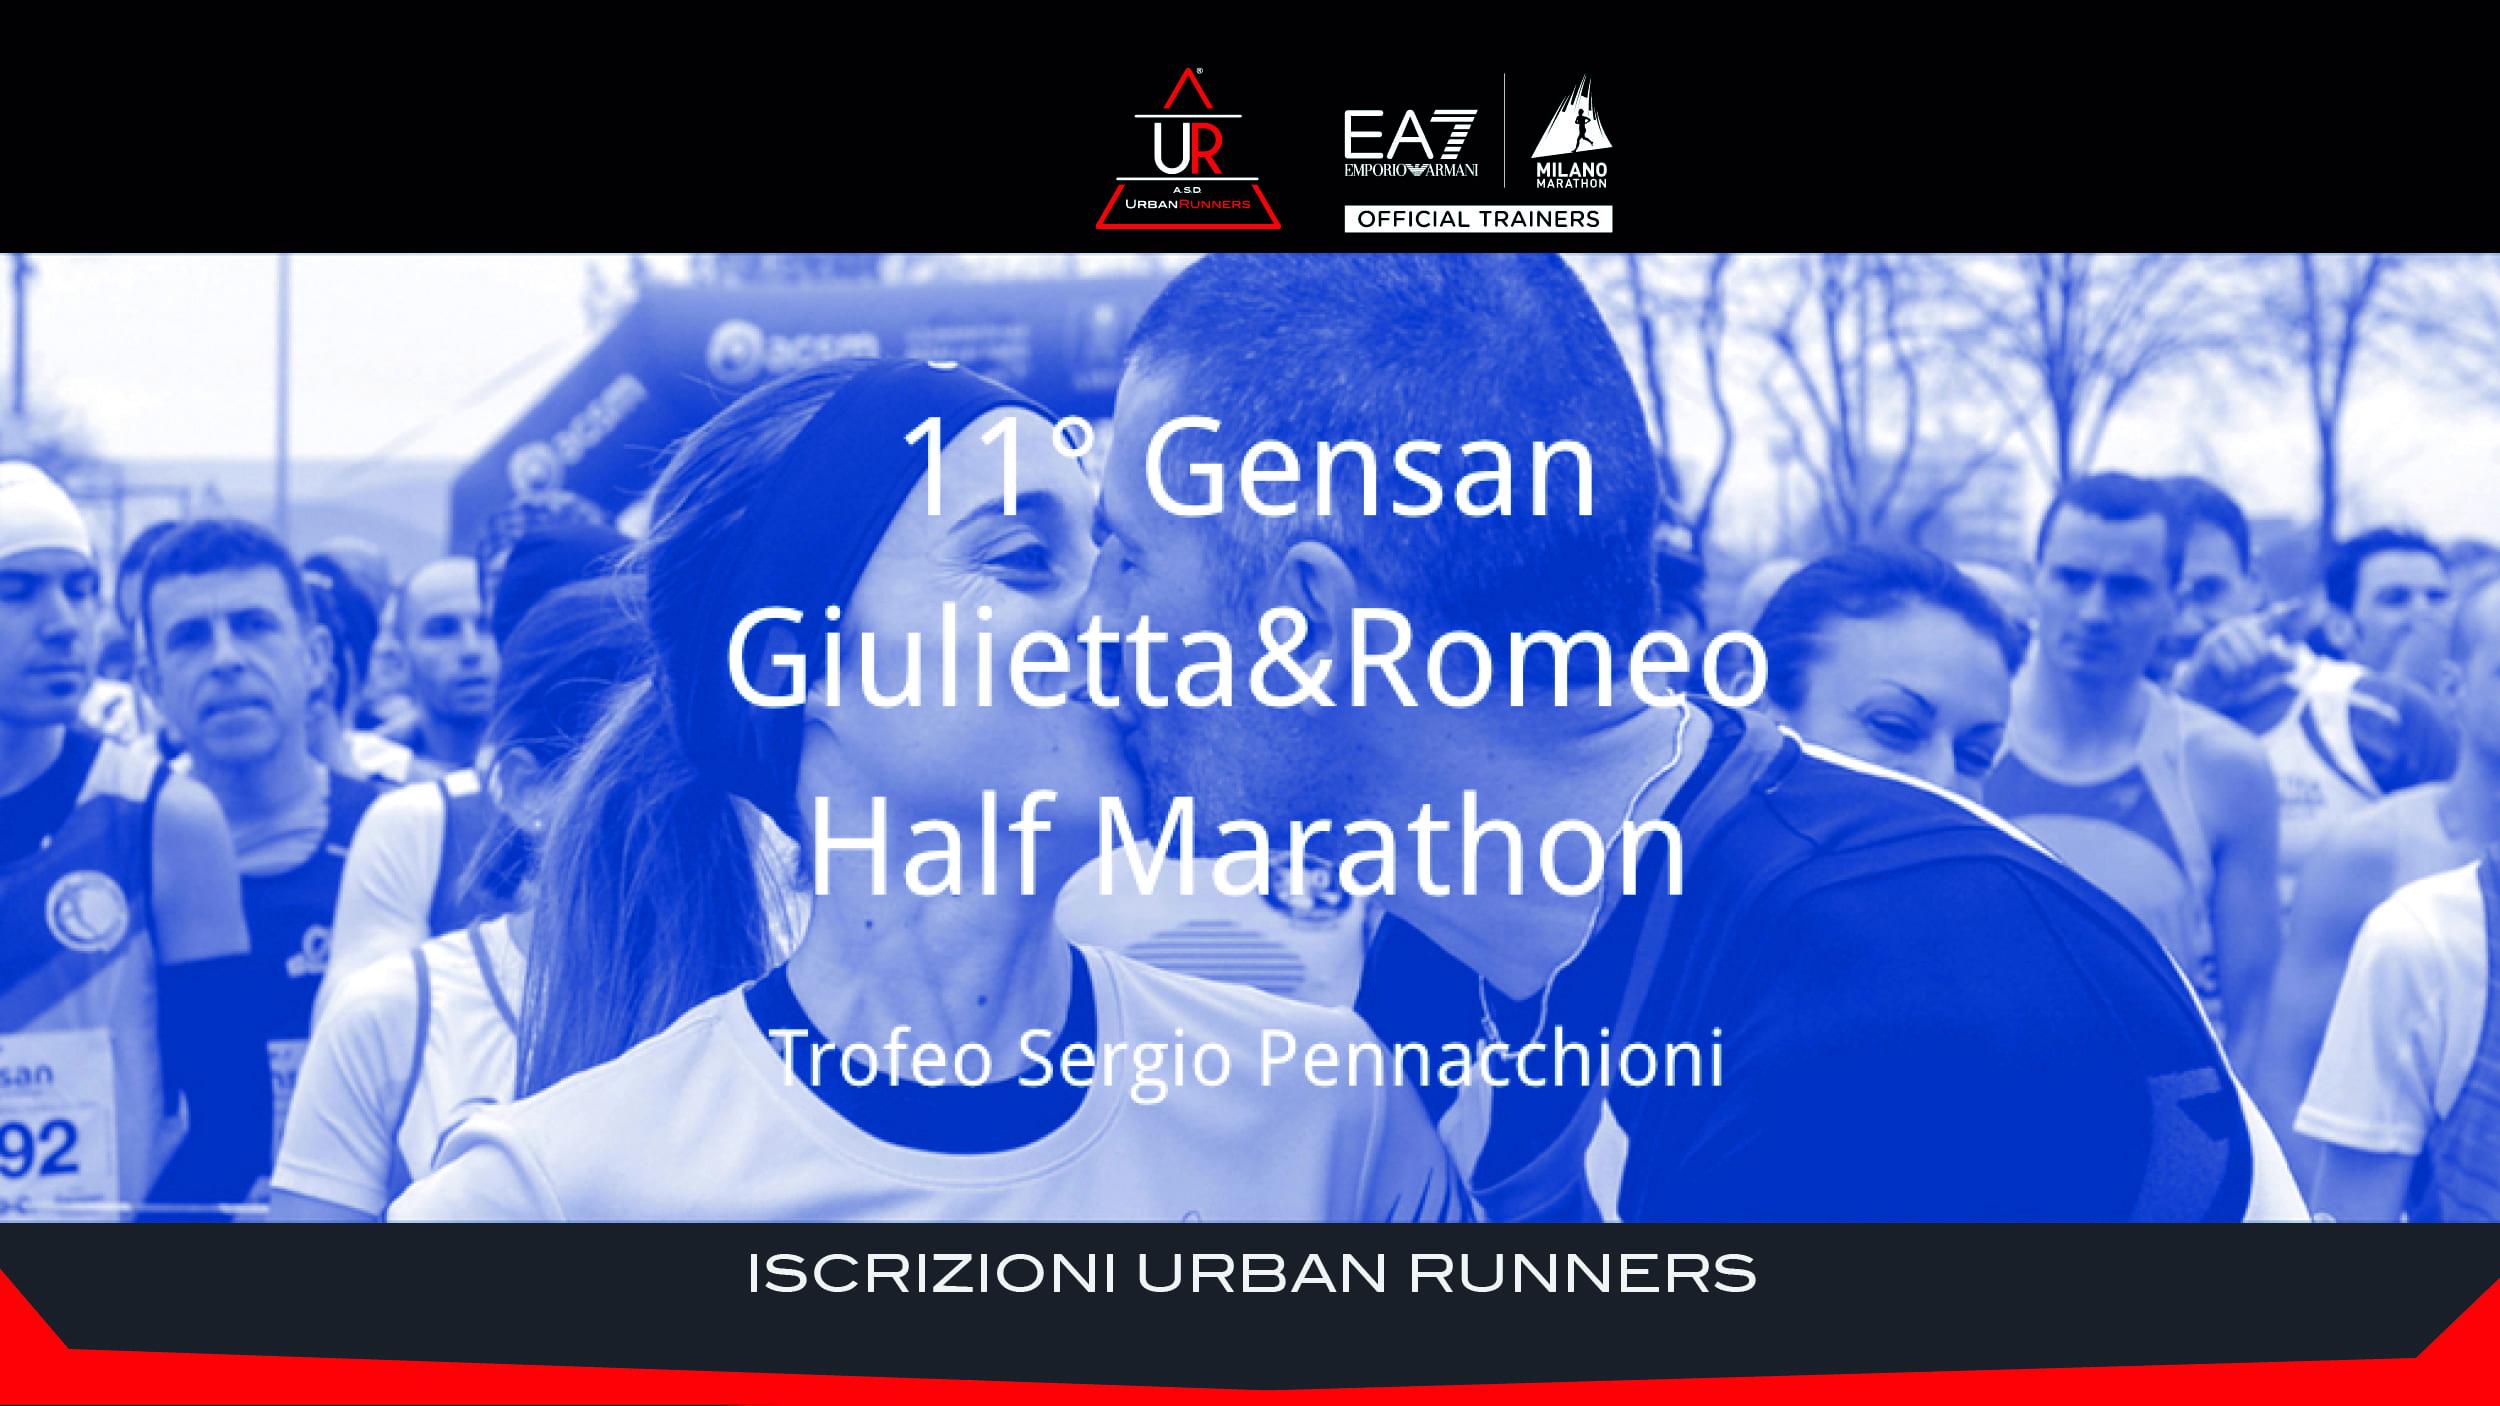 Gensan Giulietta&Romeo Half Marathon